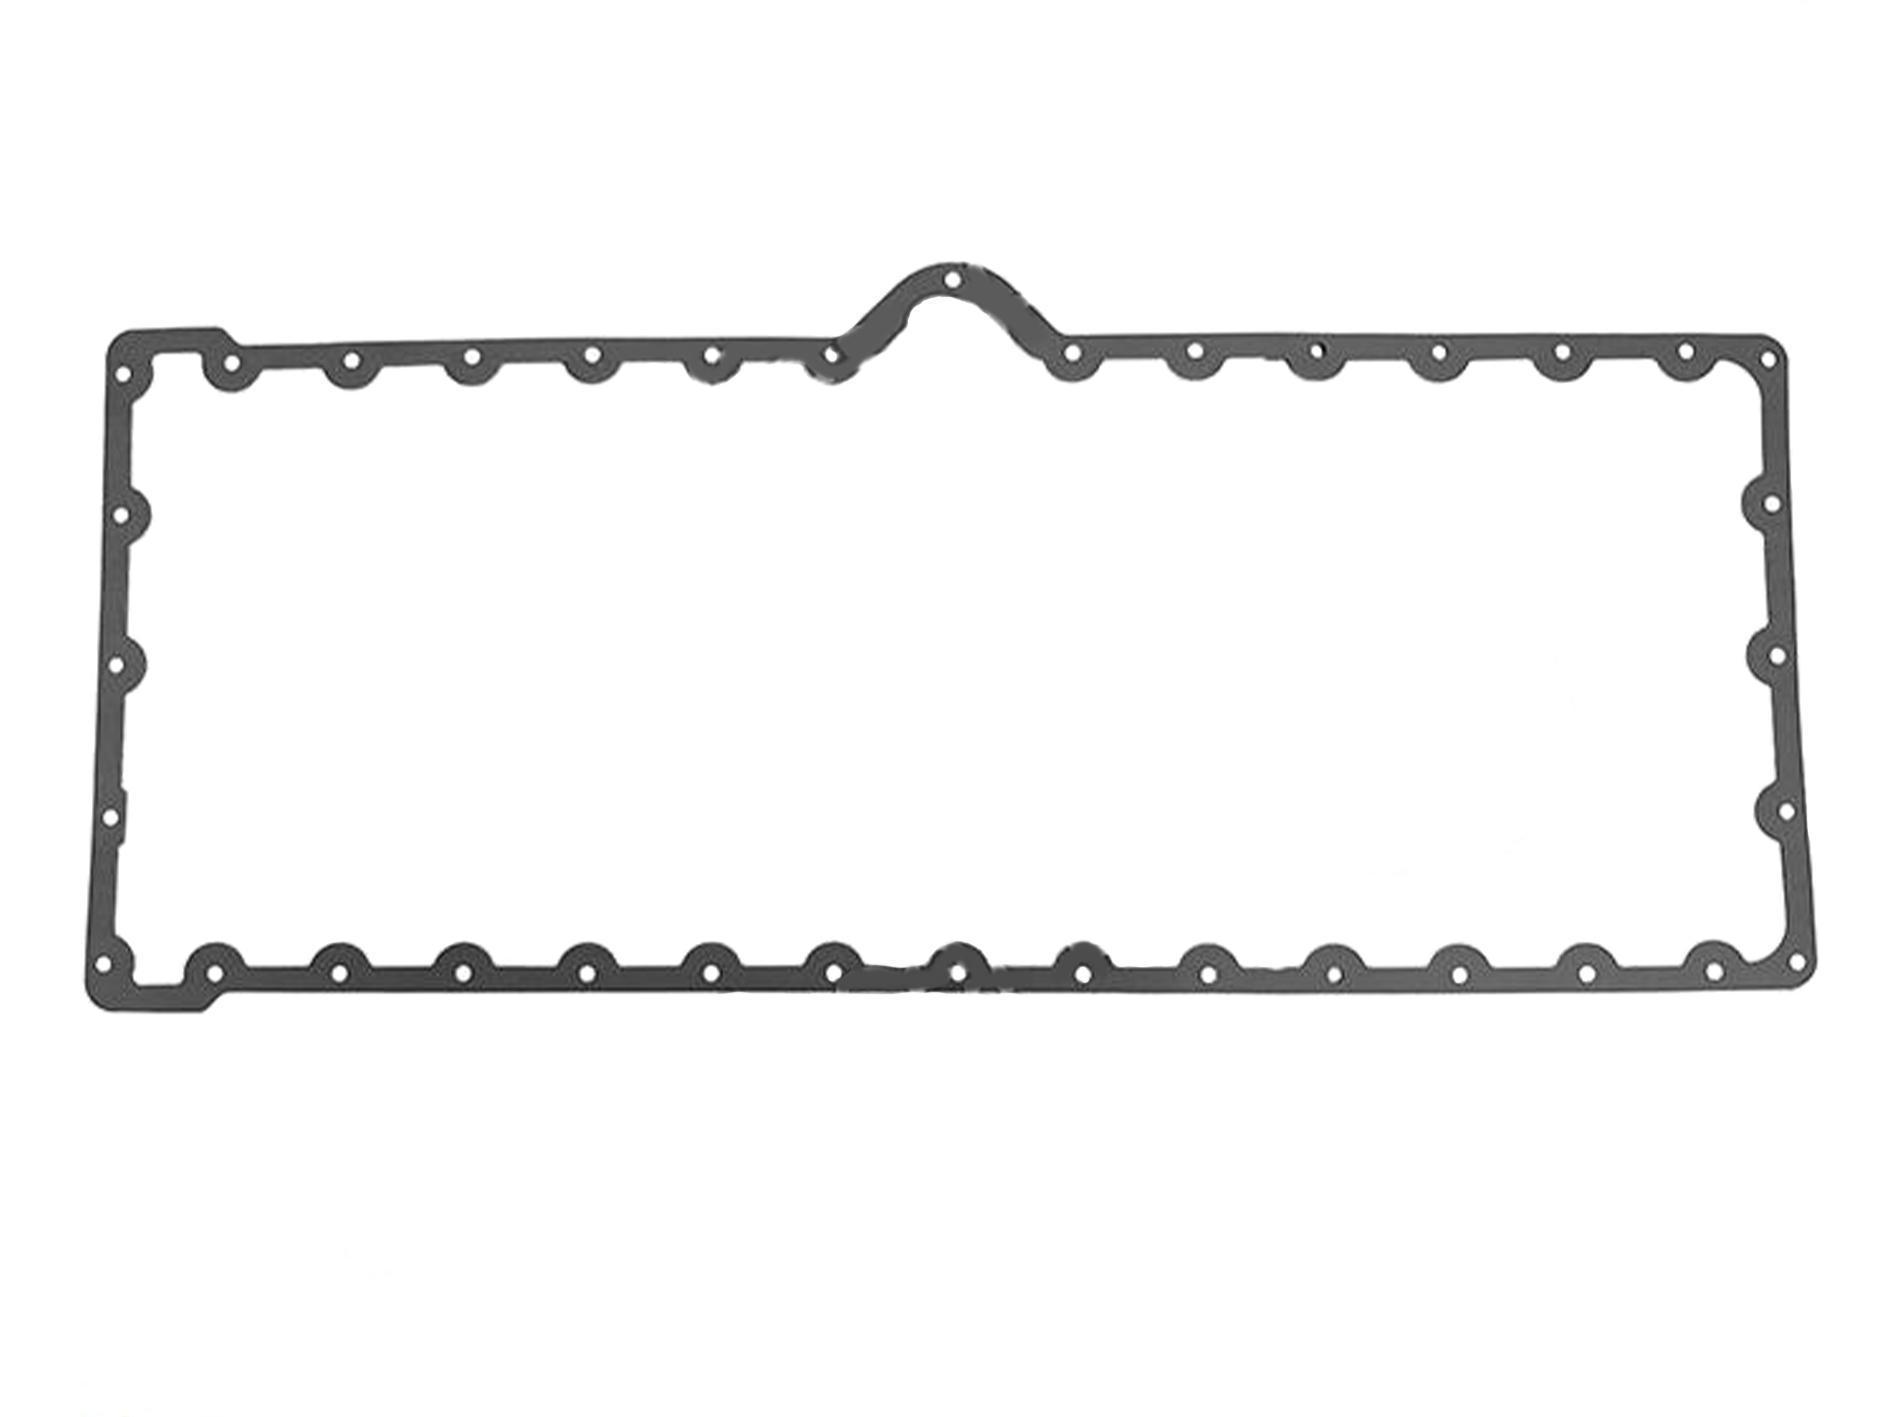 Прокладка поддона D936 / D946 (10126427)